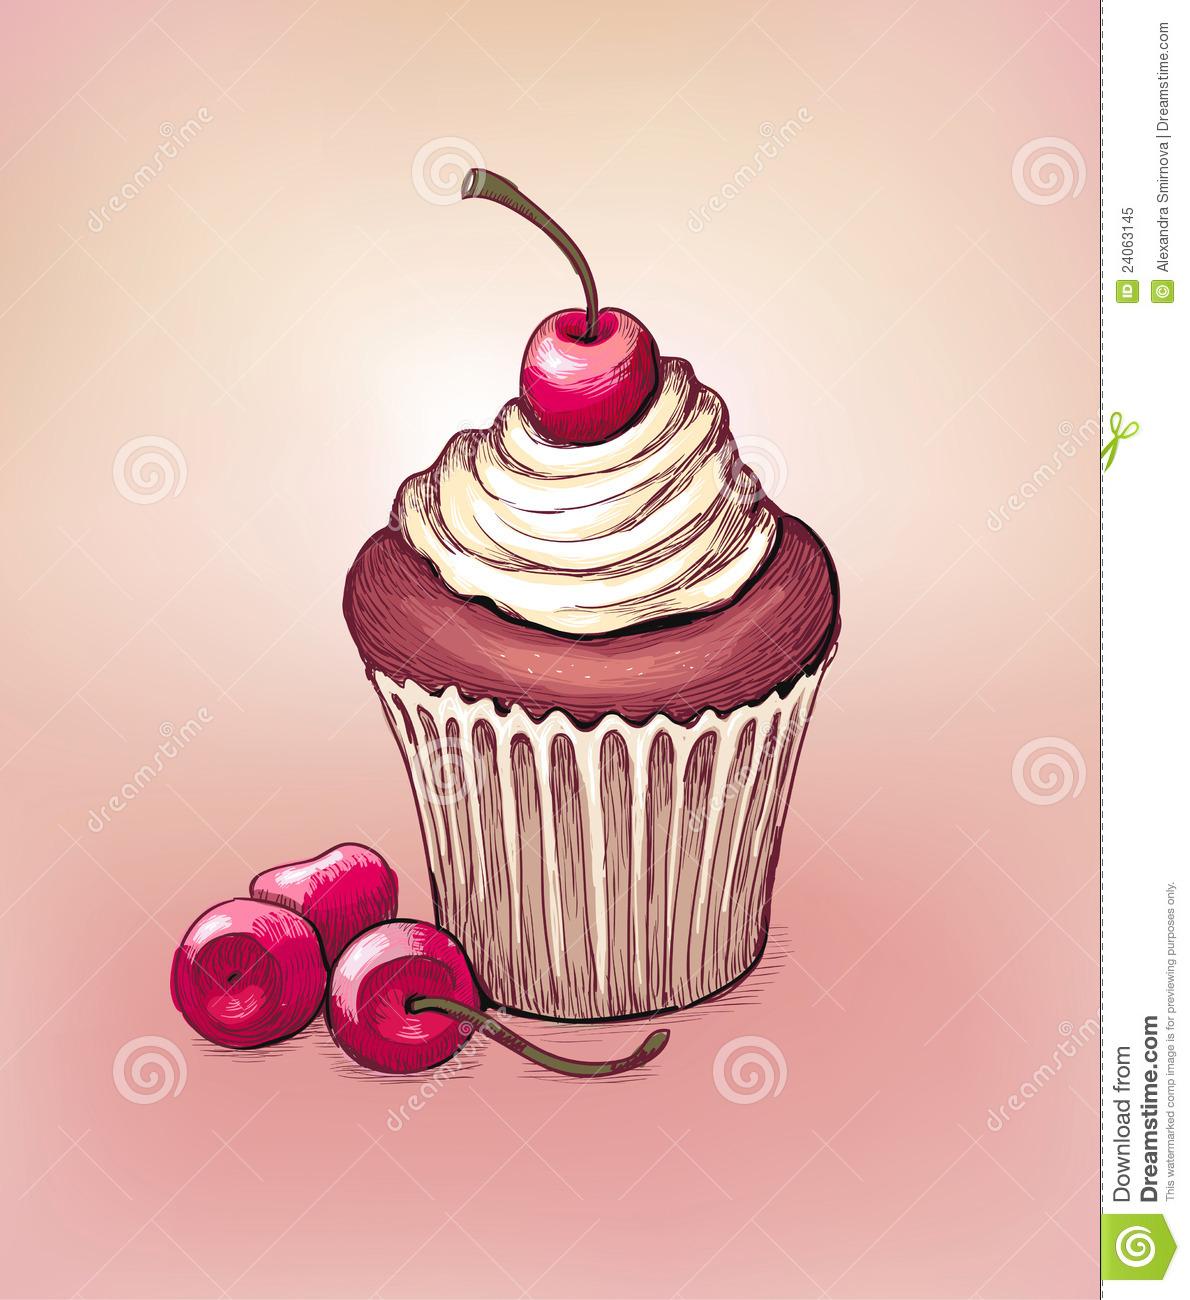 Drawn cake cherry Mice icecream print Digital cherry